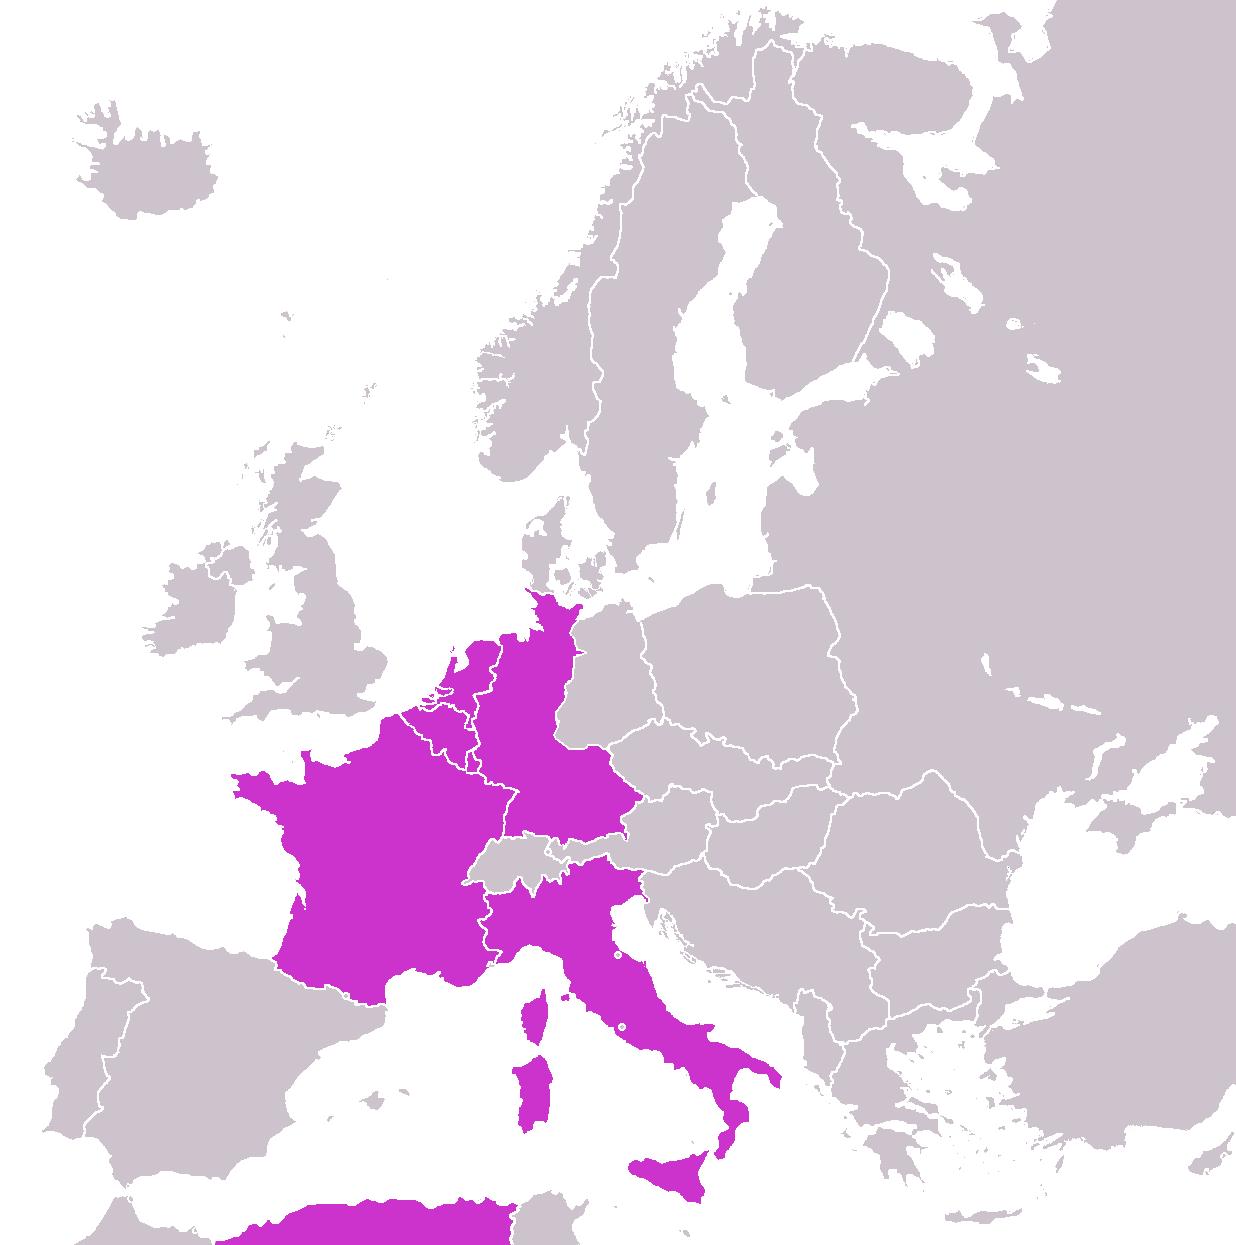 5 Common Defense Mechanisms treaty establishing the european defence community - wikipedia